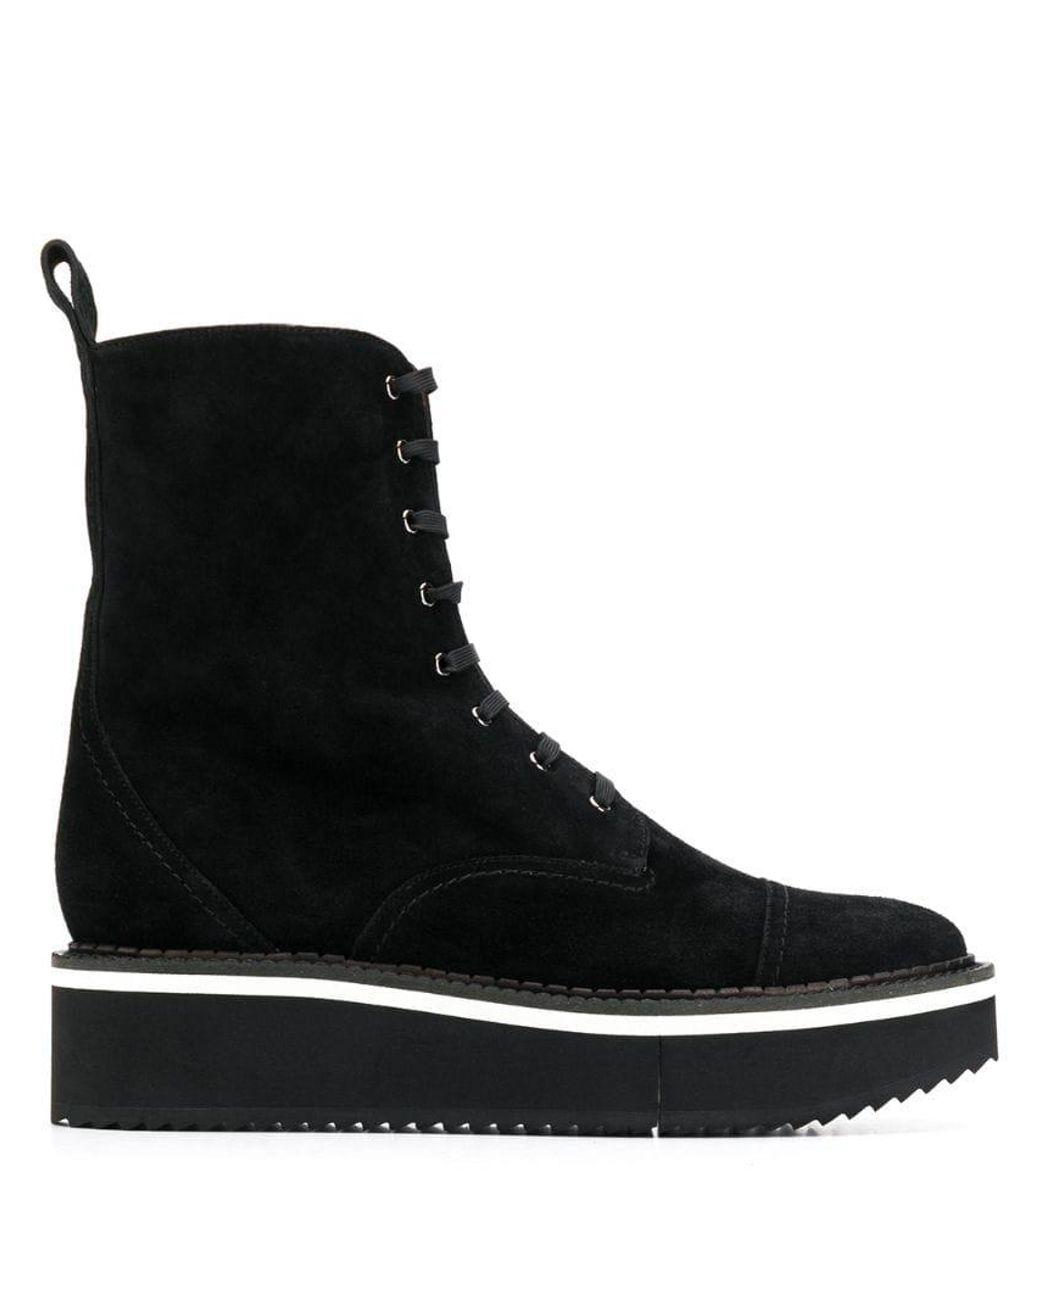 701c85b0f85 Women's Black Short Platform Boots